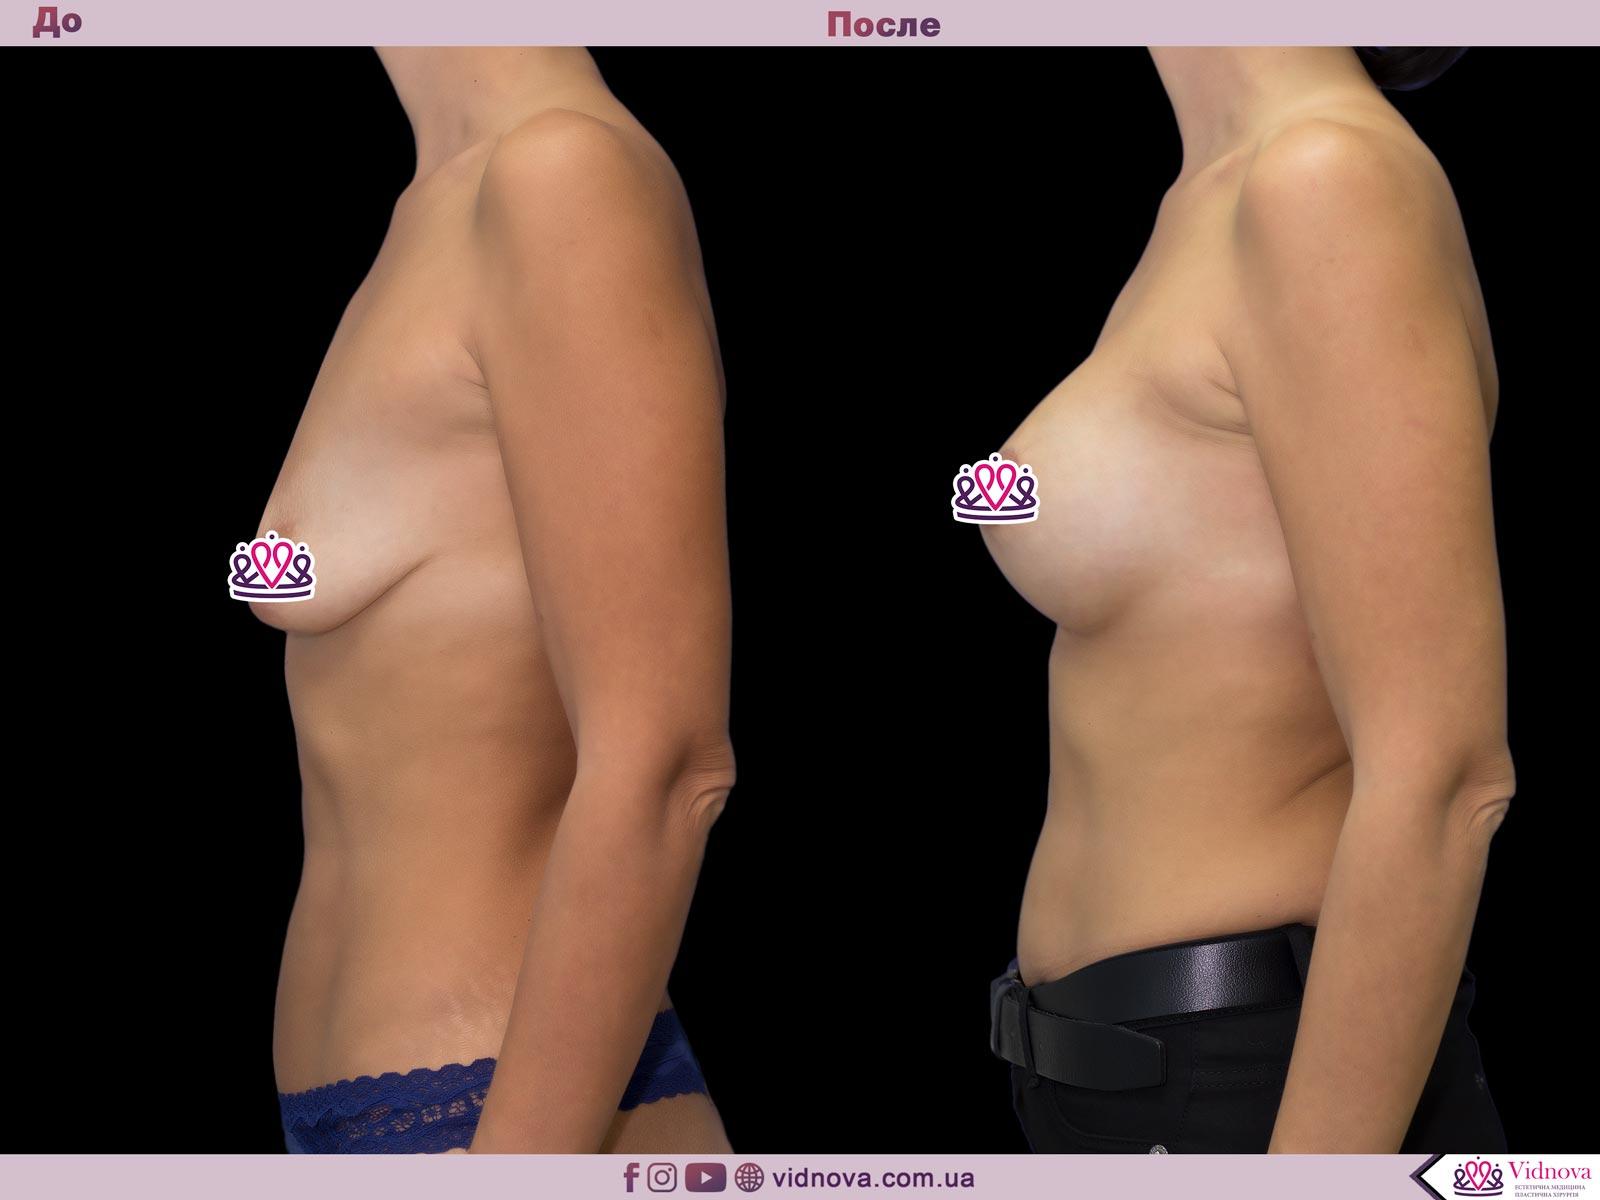 Подтяжка груди: Фото ДО и ПОСЛЕ - Пример №19-3 - Клиника Vidnova